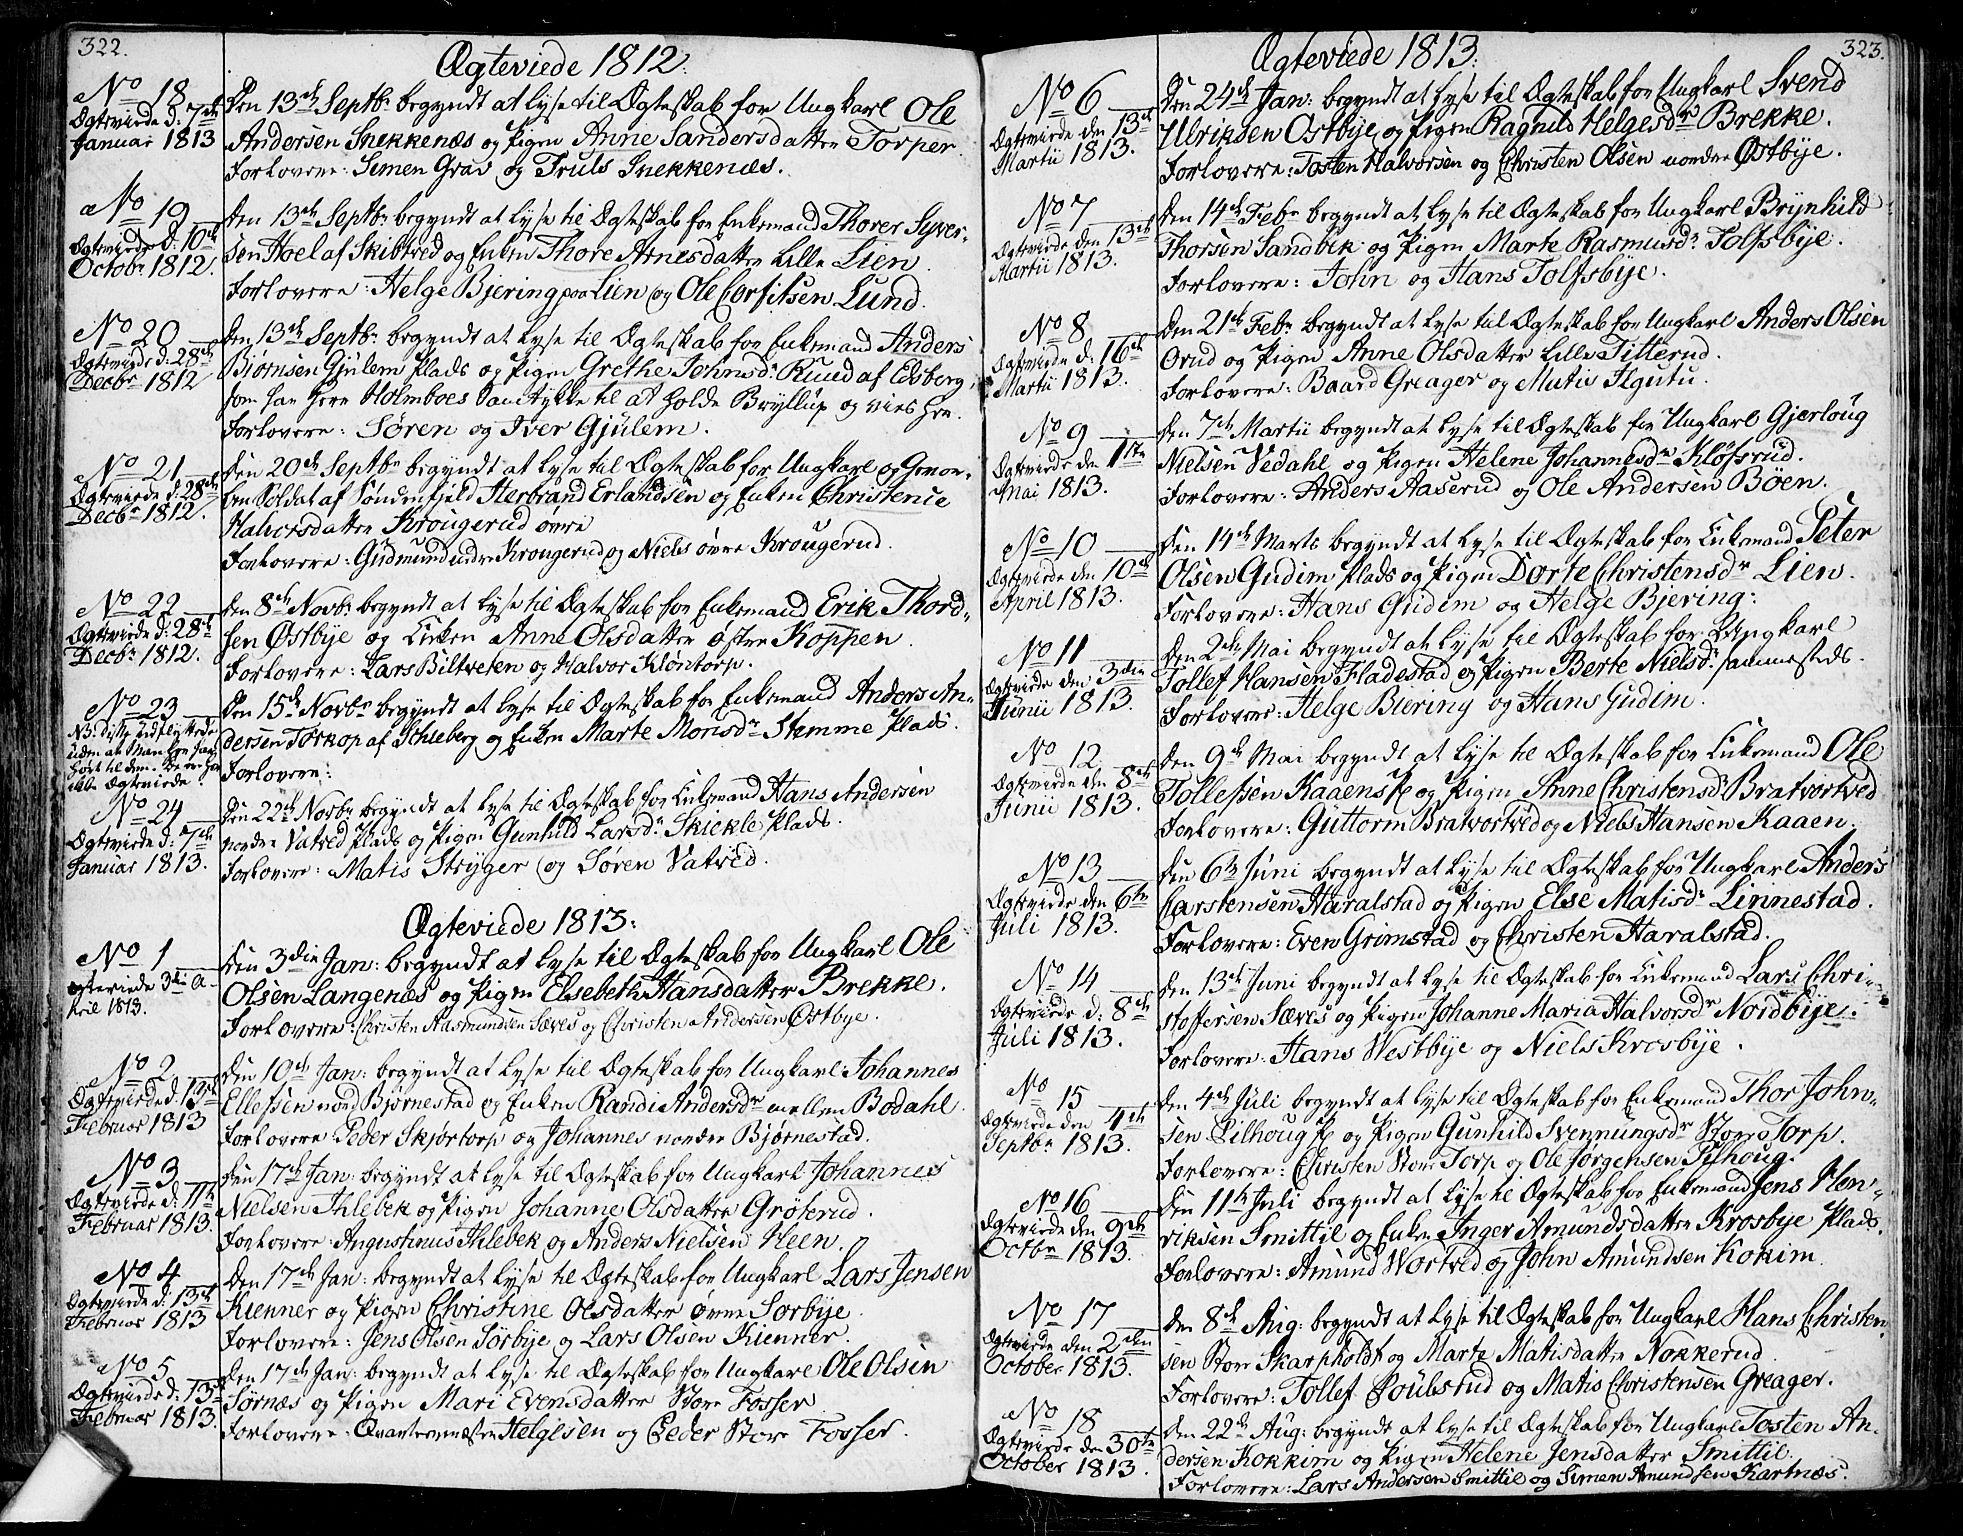 SAO, Rakkestad prestekontor Kirkebøker, F/Fa/L0005: Ministerialbok nr. I 5, 1784-1814, s. 322-323